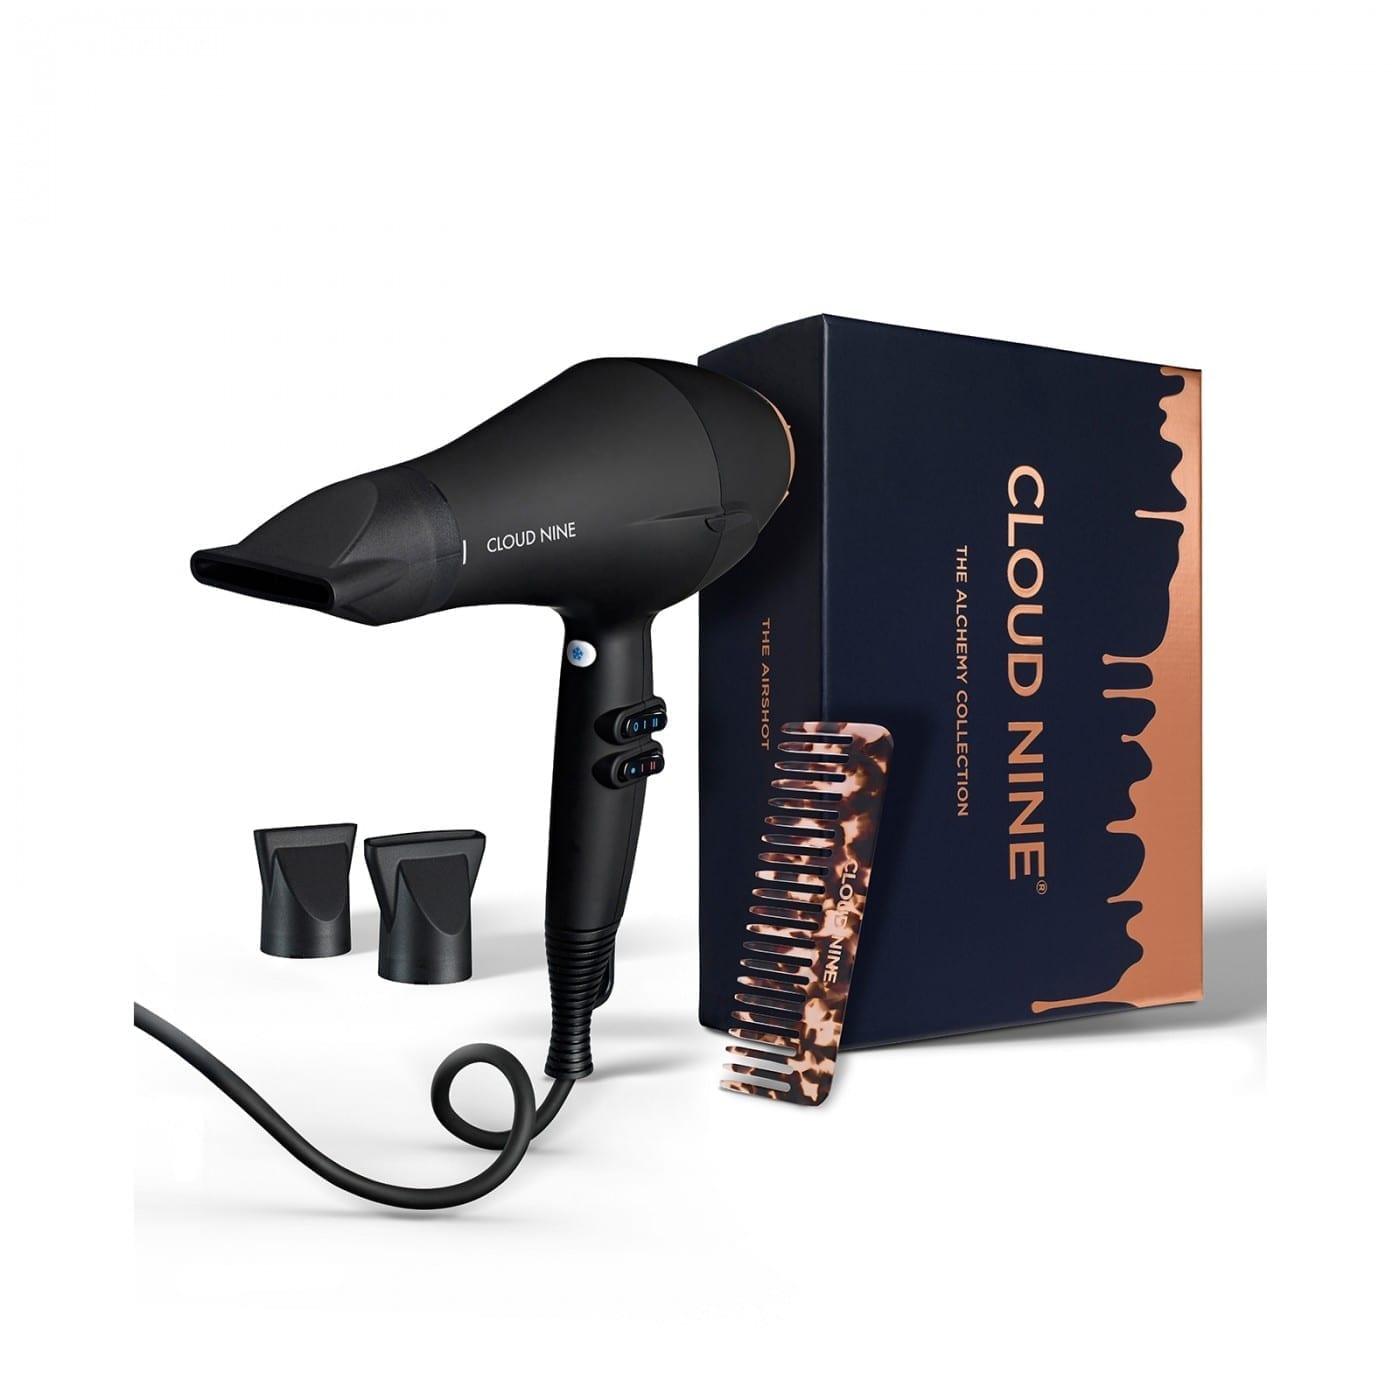 Cloud Nine Airshot Hairdryer Alchemy Gift Set 2019 + FREE Luxury Texture Comb